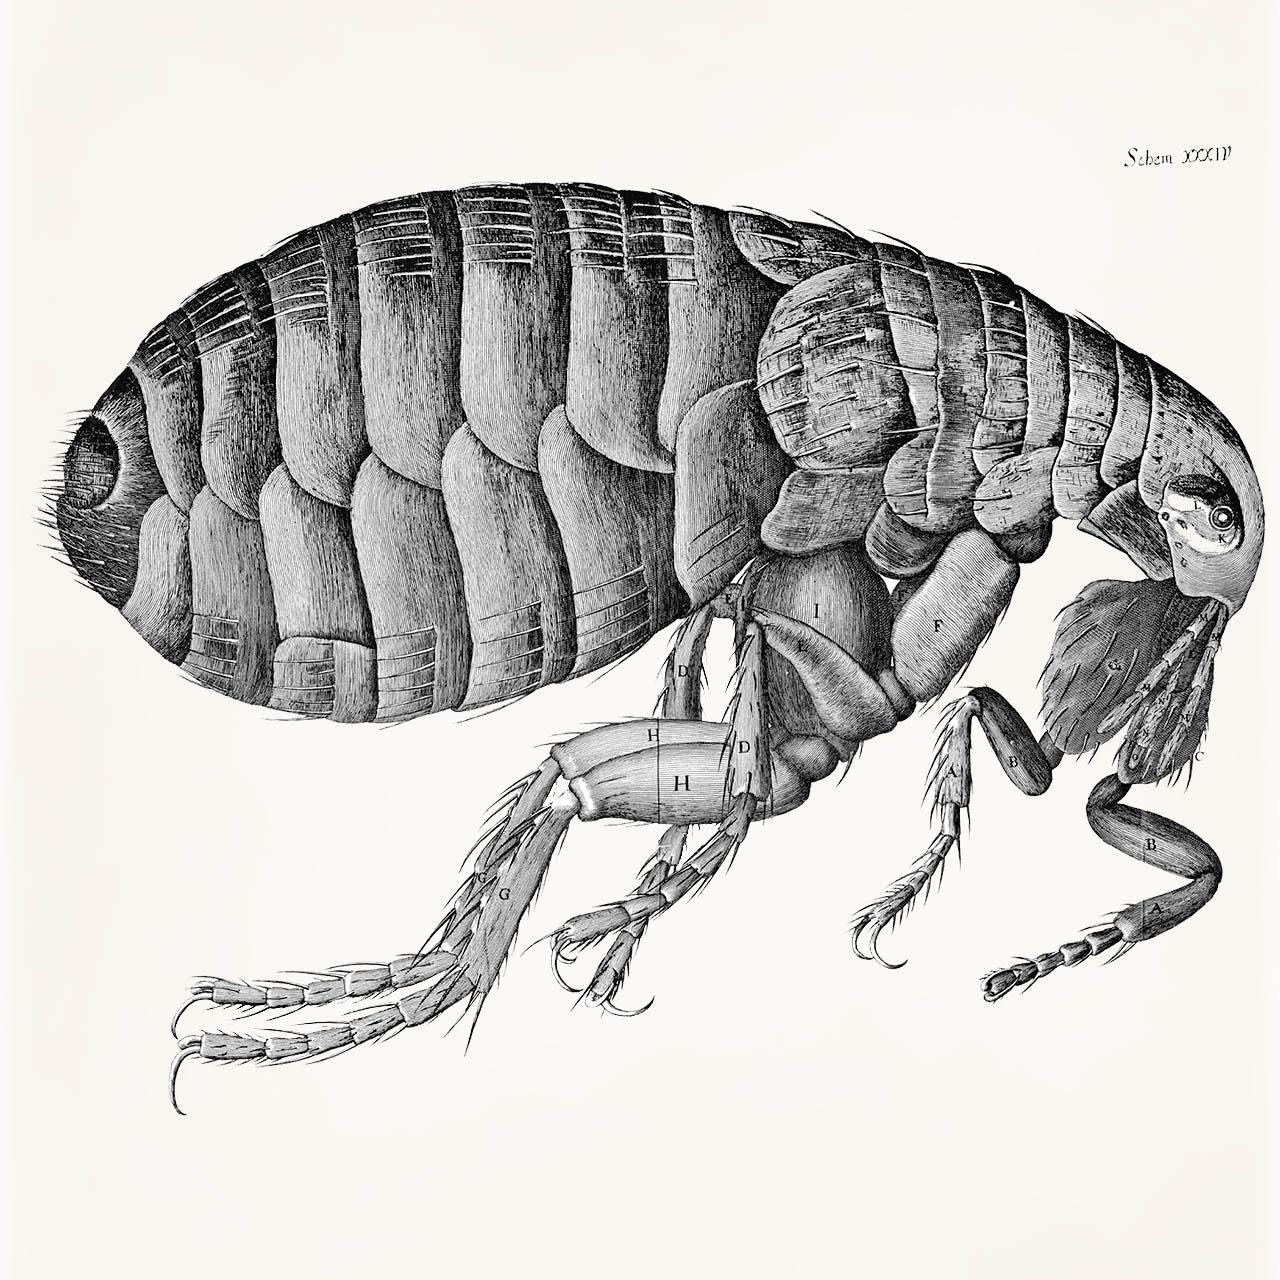 Hooke's flea illustration